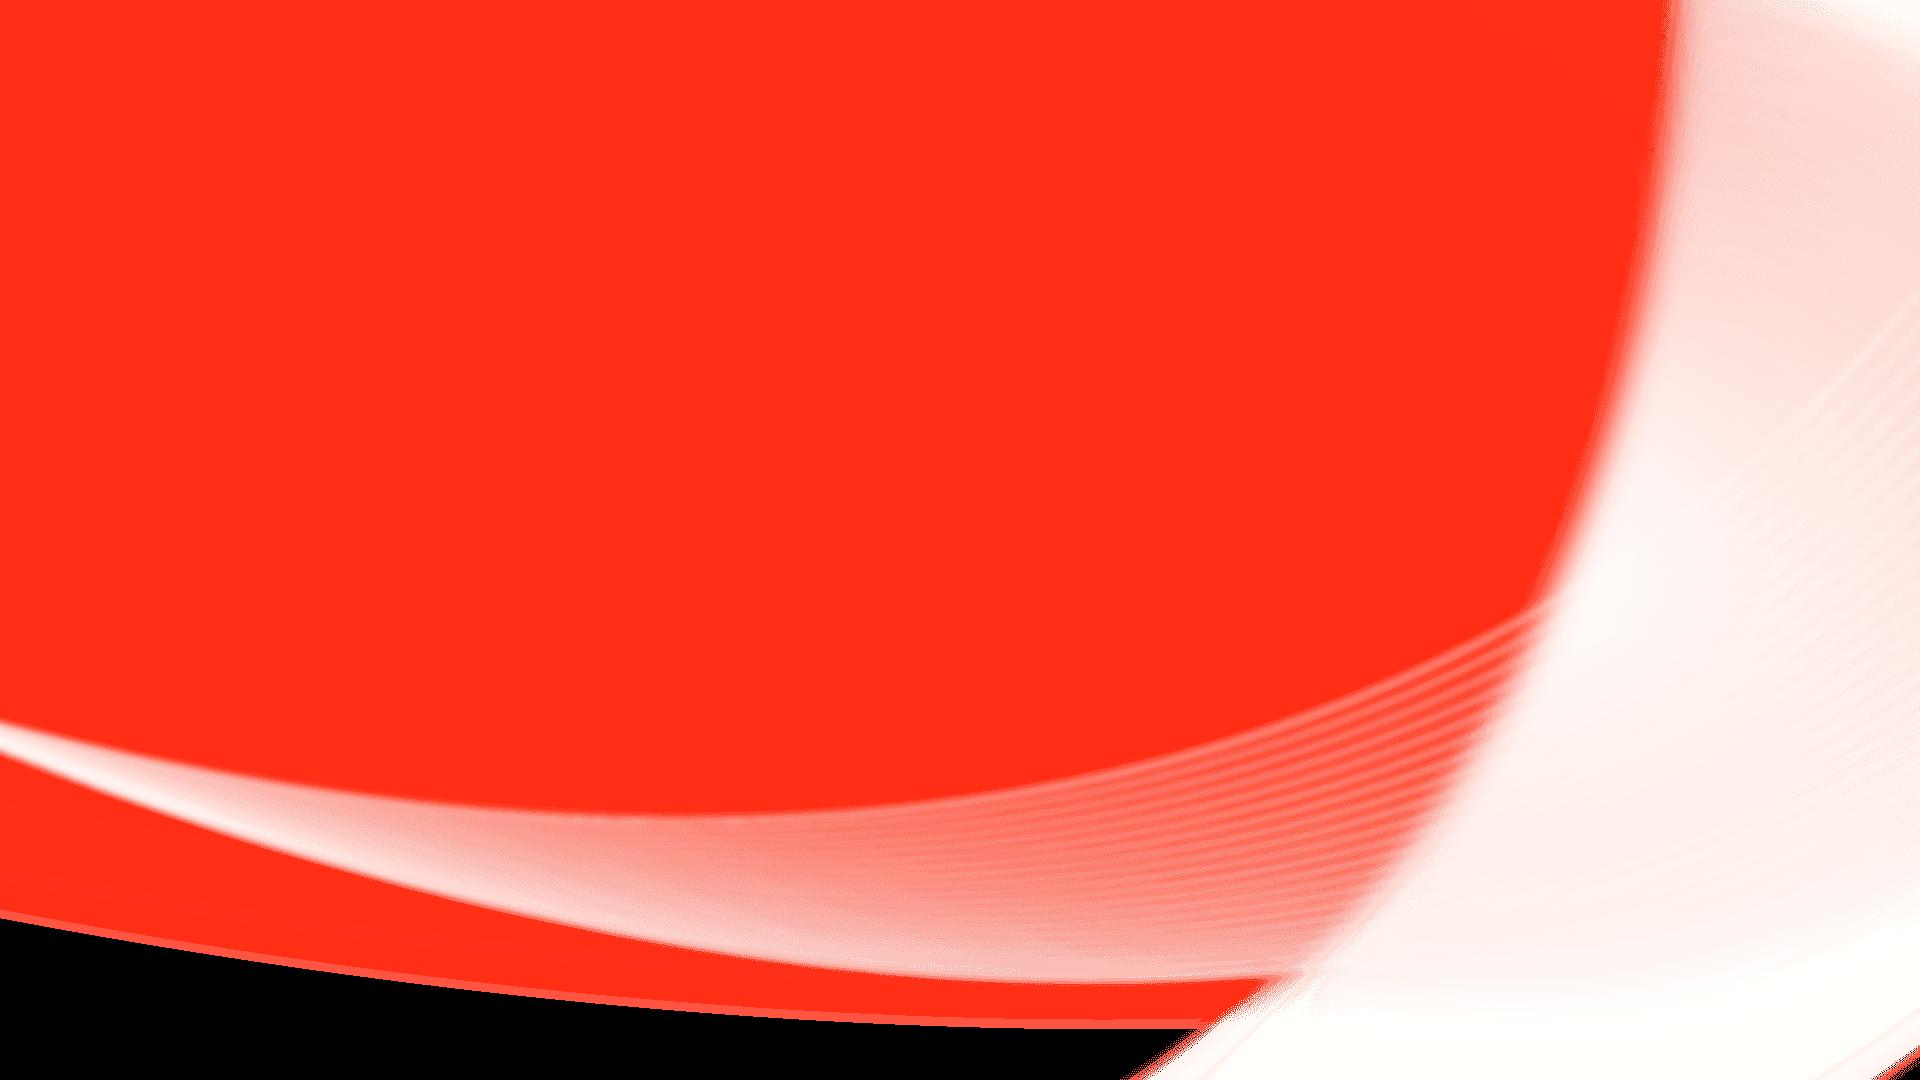 Download Png Transparent Background Google Plus Logo.